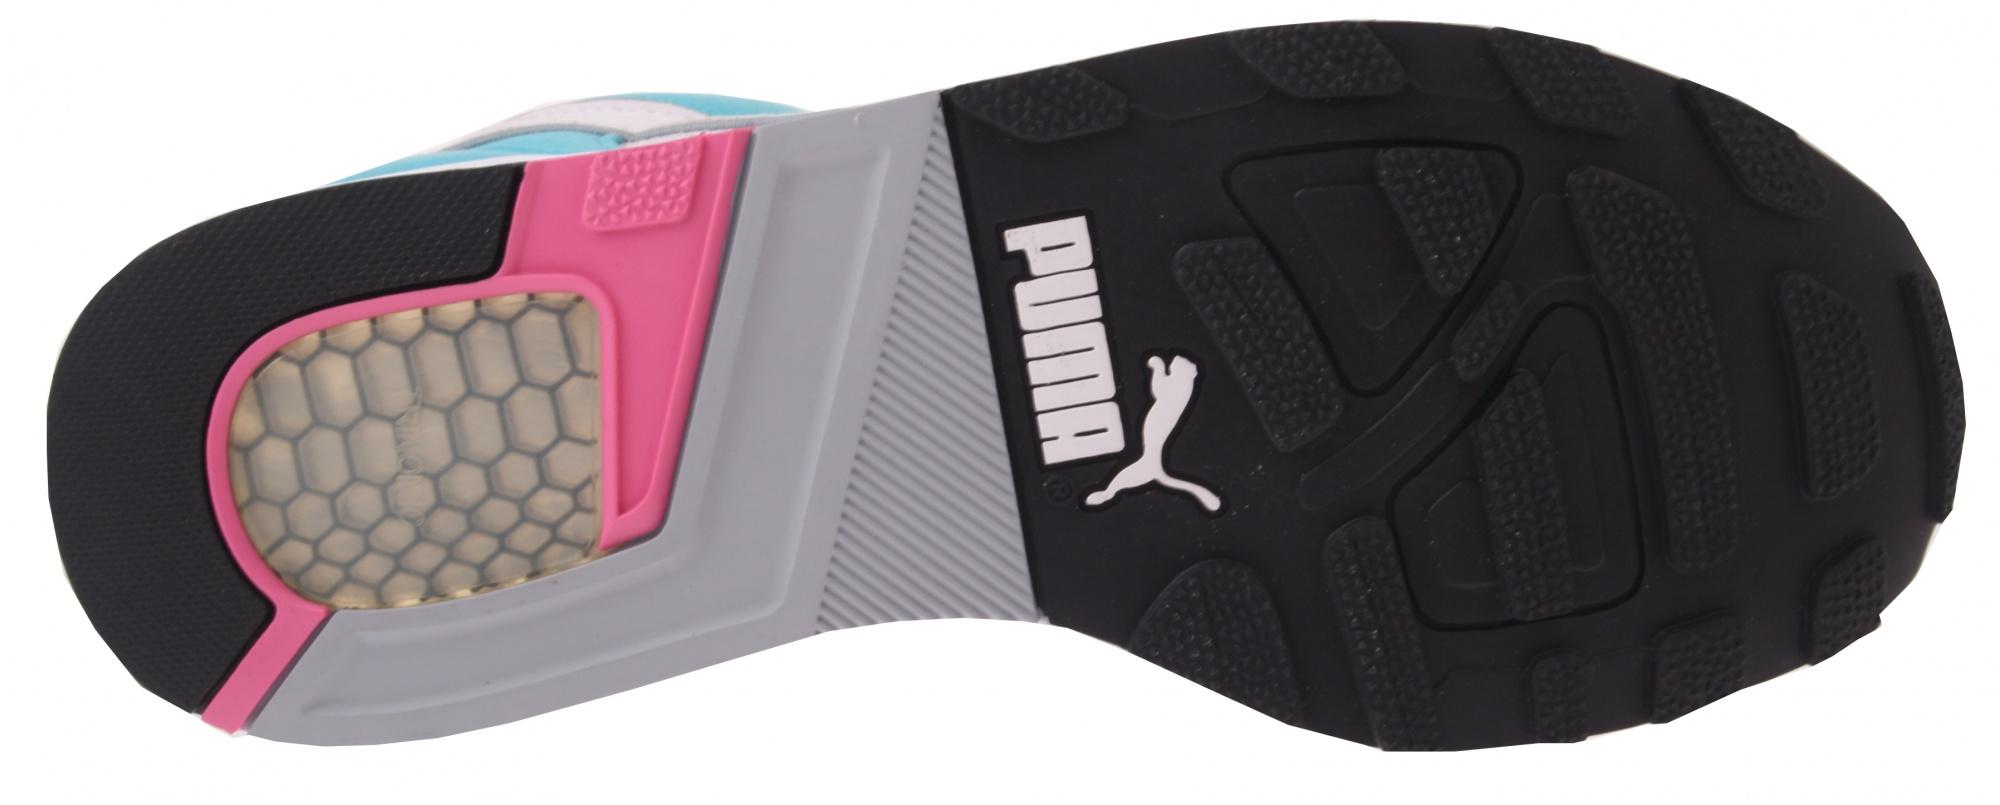 0cb80d49a80 Puma sneakers Trinomix XT 1 plus heren wit - Internet-Sport&Casuals